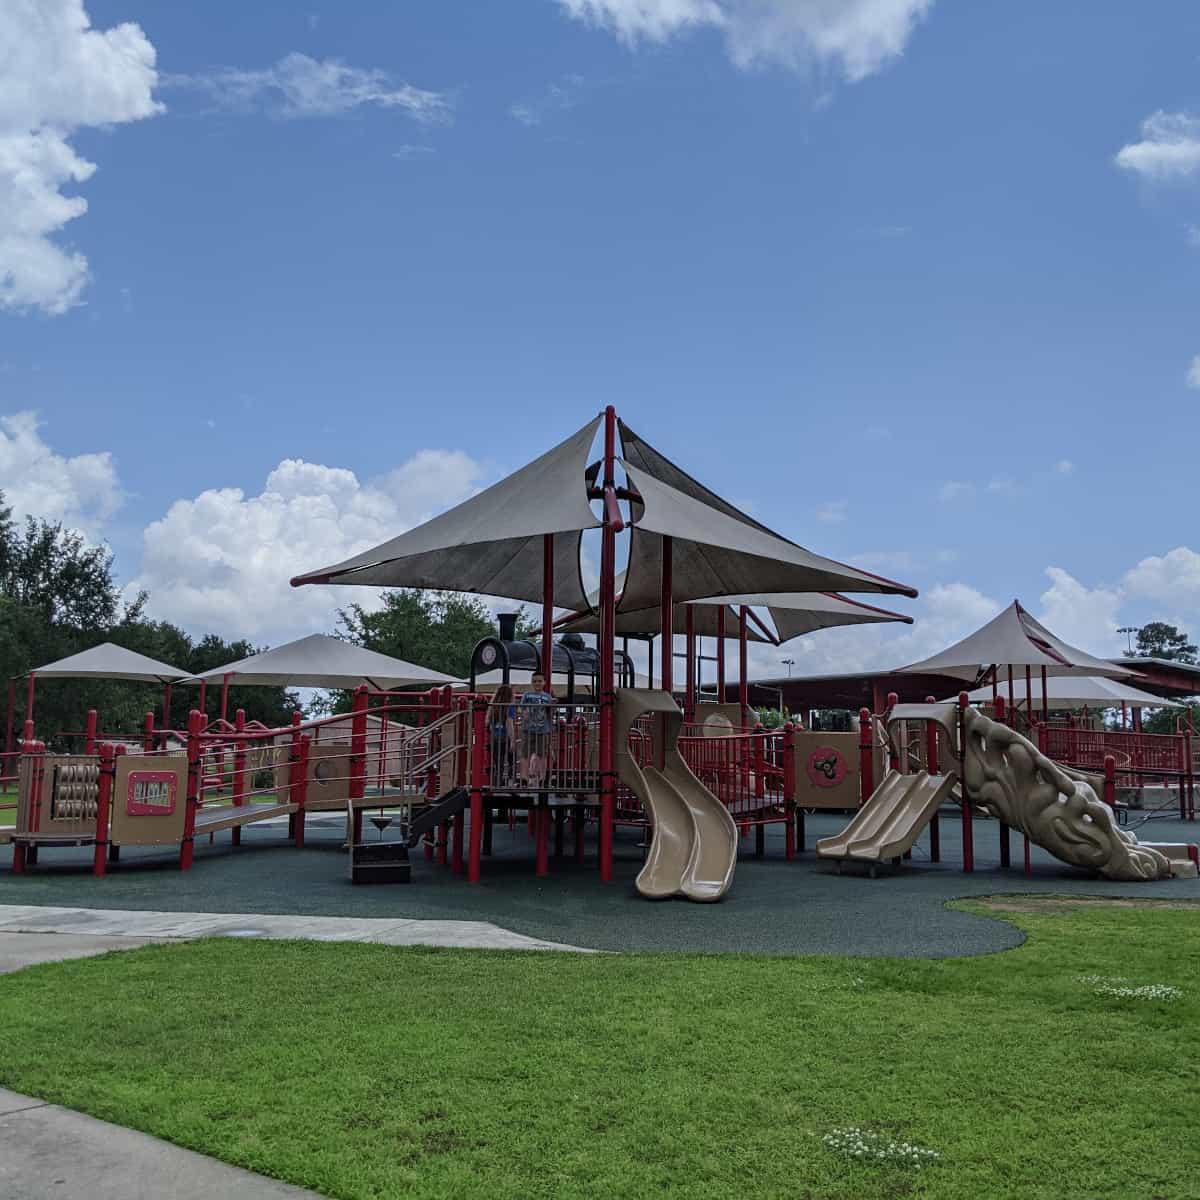 Katy Play Station Playground